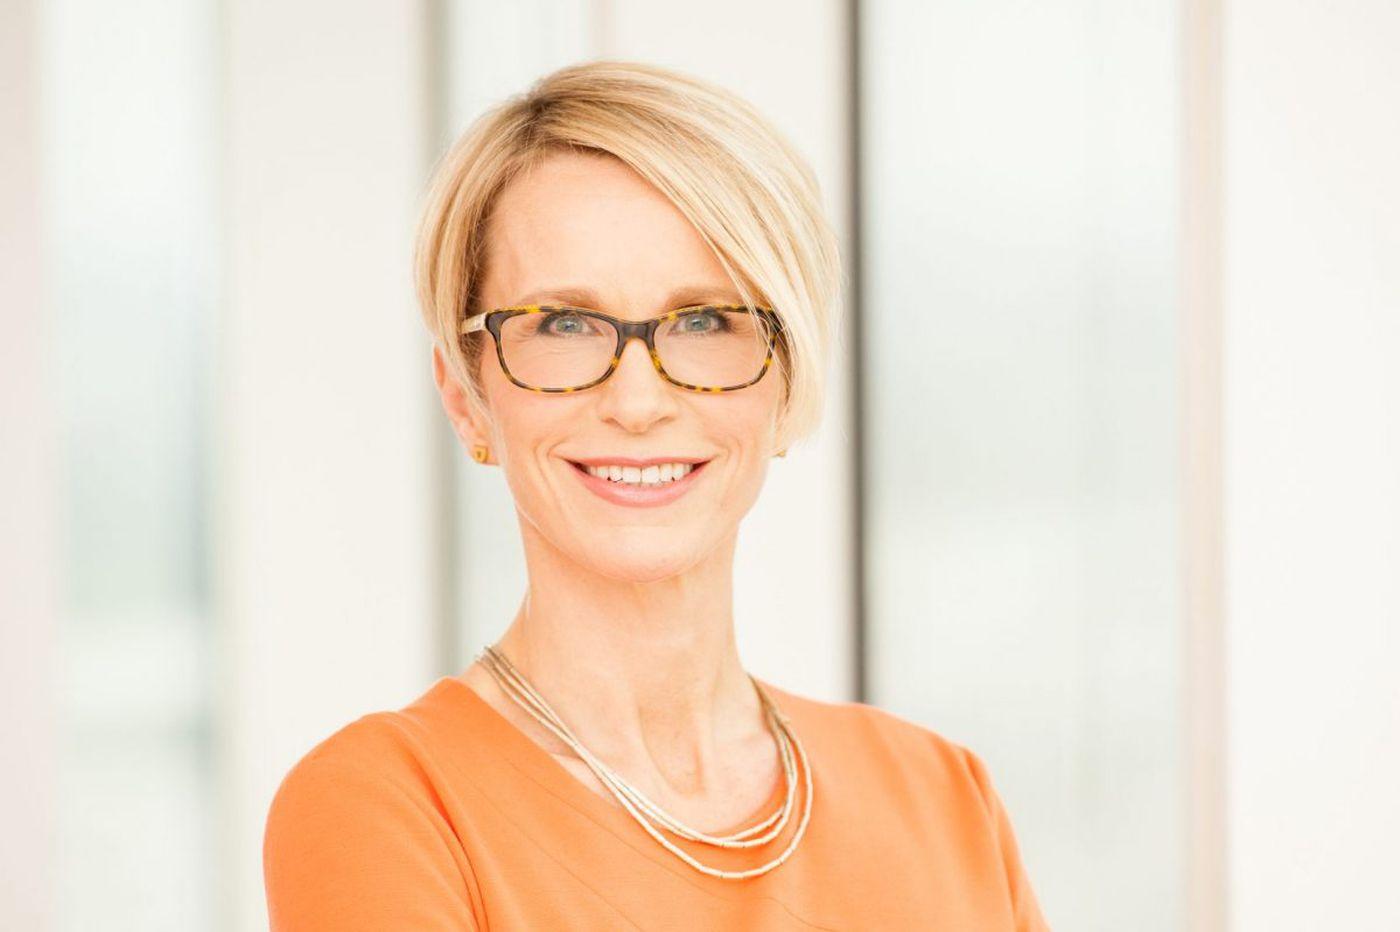 Glaxo's purchase of Novartis consumer drugs shows Emma Walmsley's deal making skills